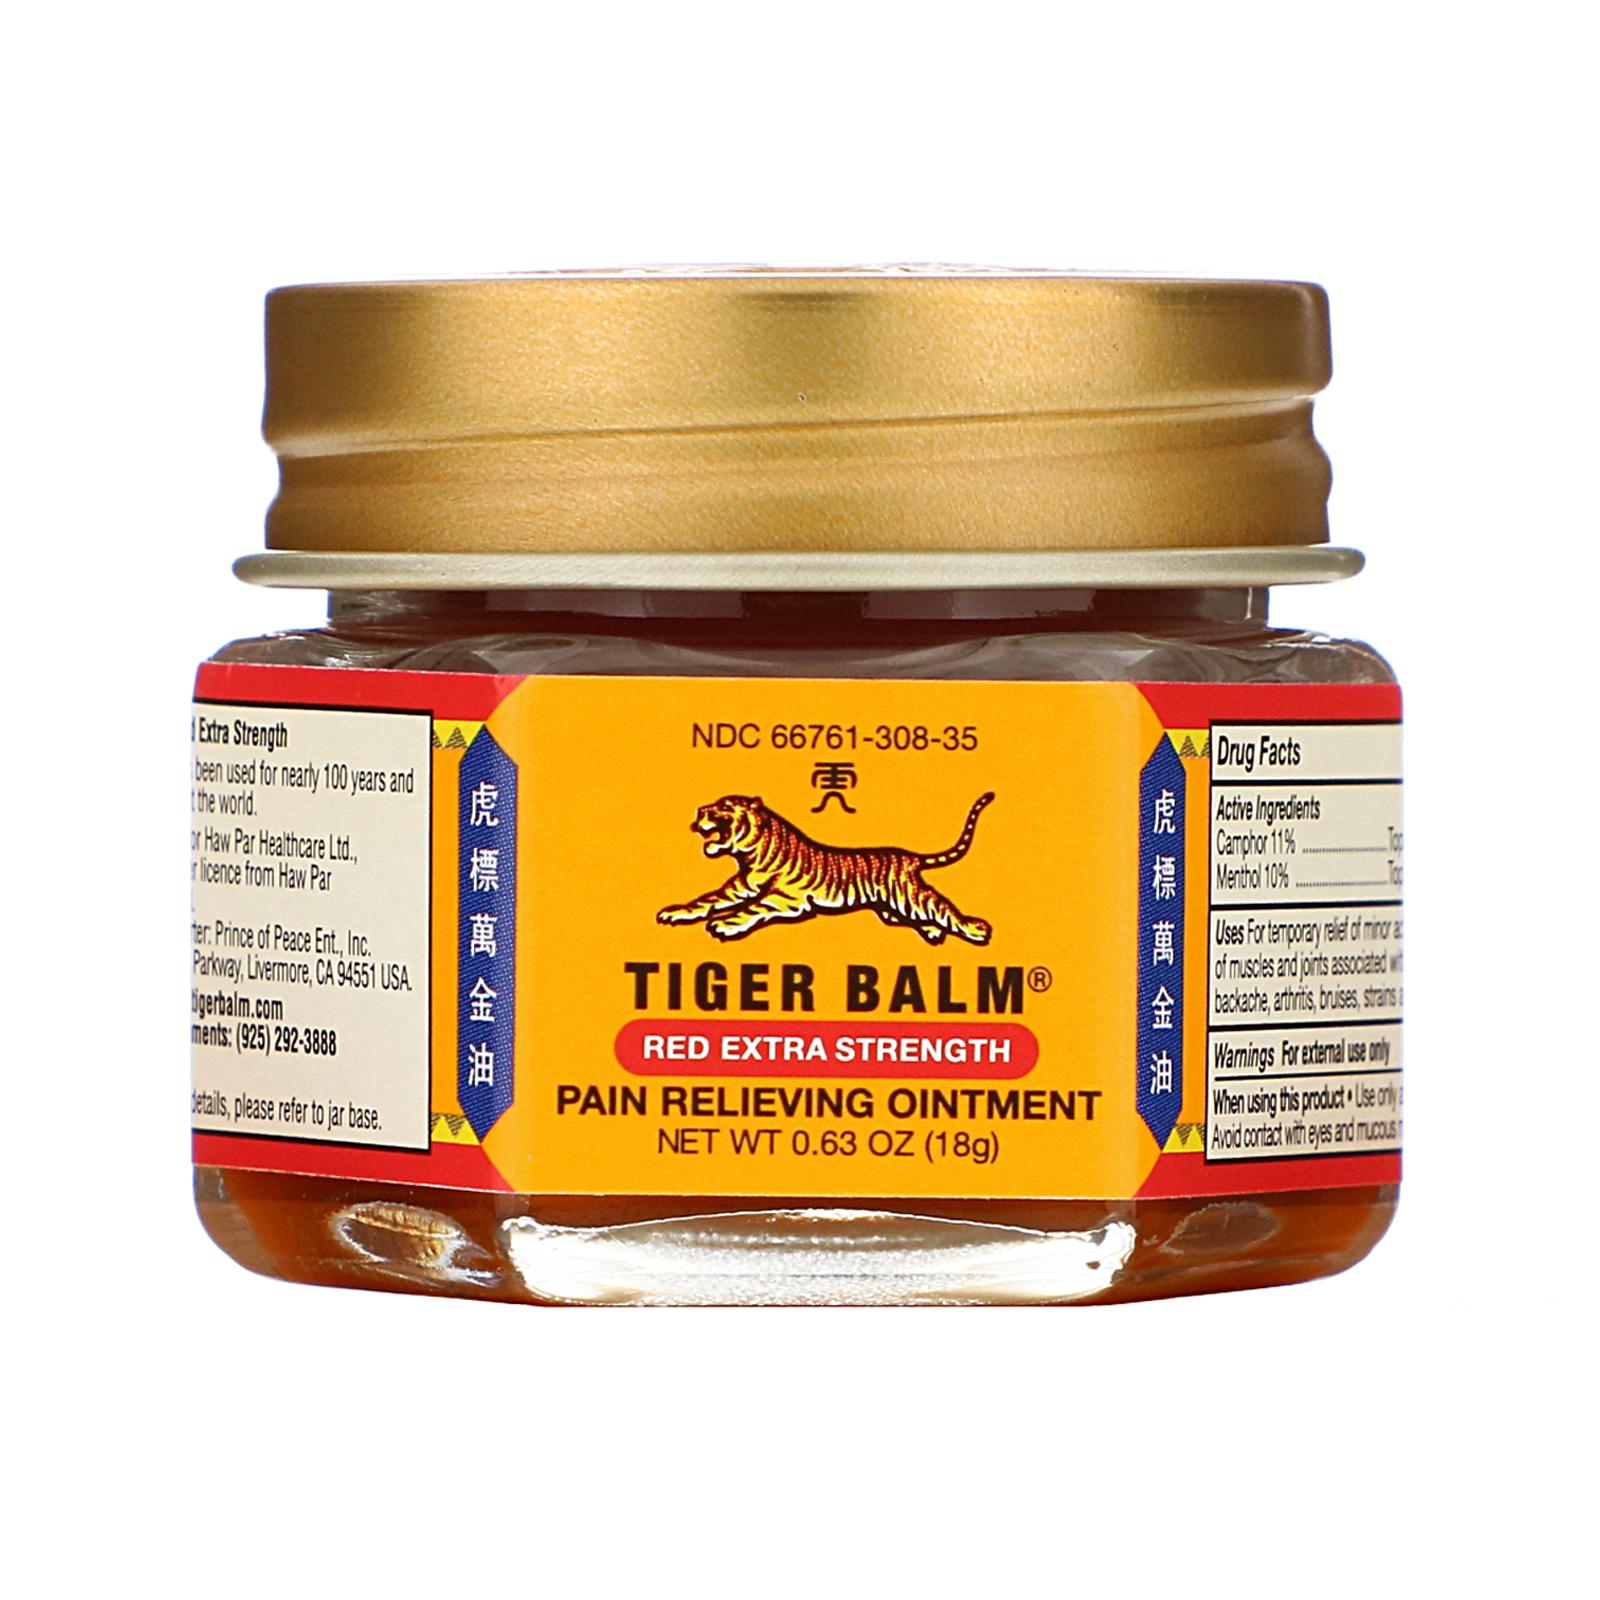 Tiger Balm مرهم مسكن للألم قوة مضاعفة 63 أوقية 18 جم Iherb